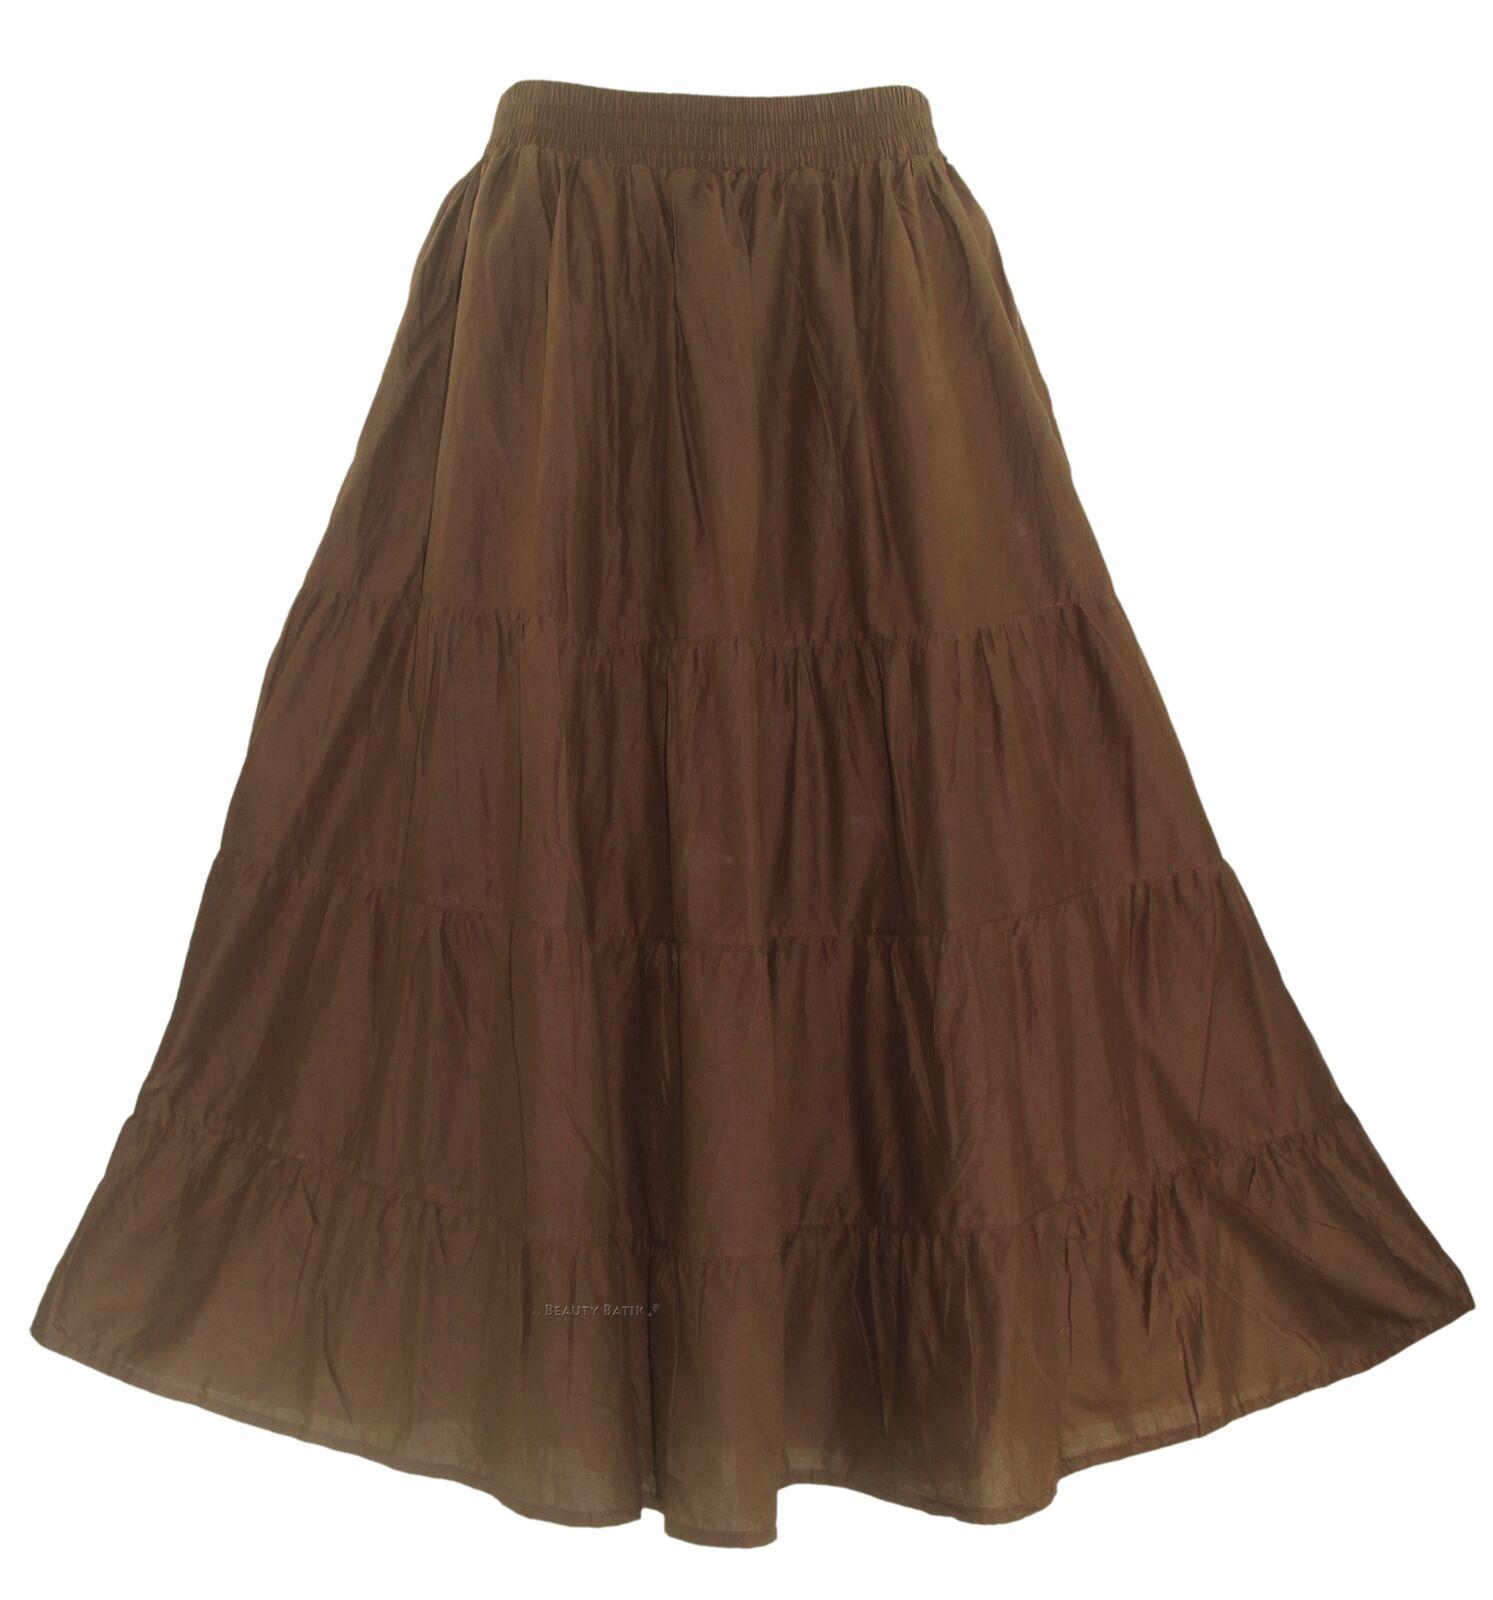 Brown Women Cotton BOHO Gypsy Long Maxi Tier Flare Skirt 1X 2X 18 20